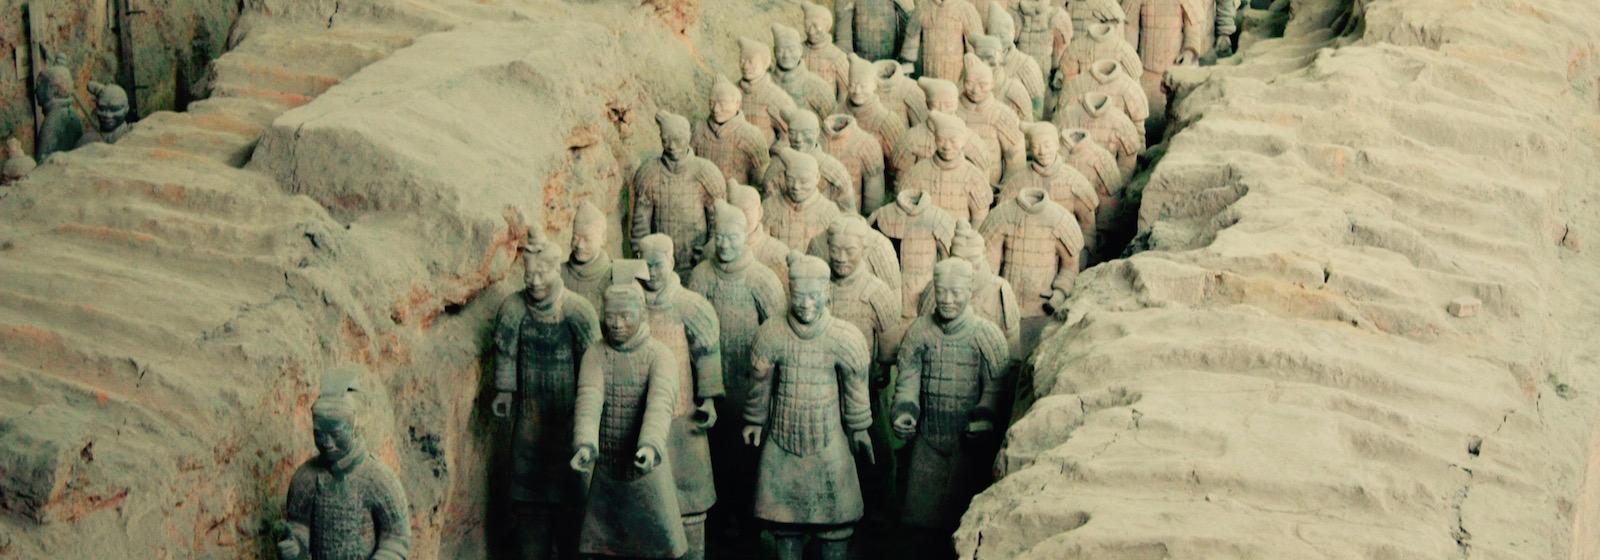 Сиань — столица десяти династий